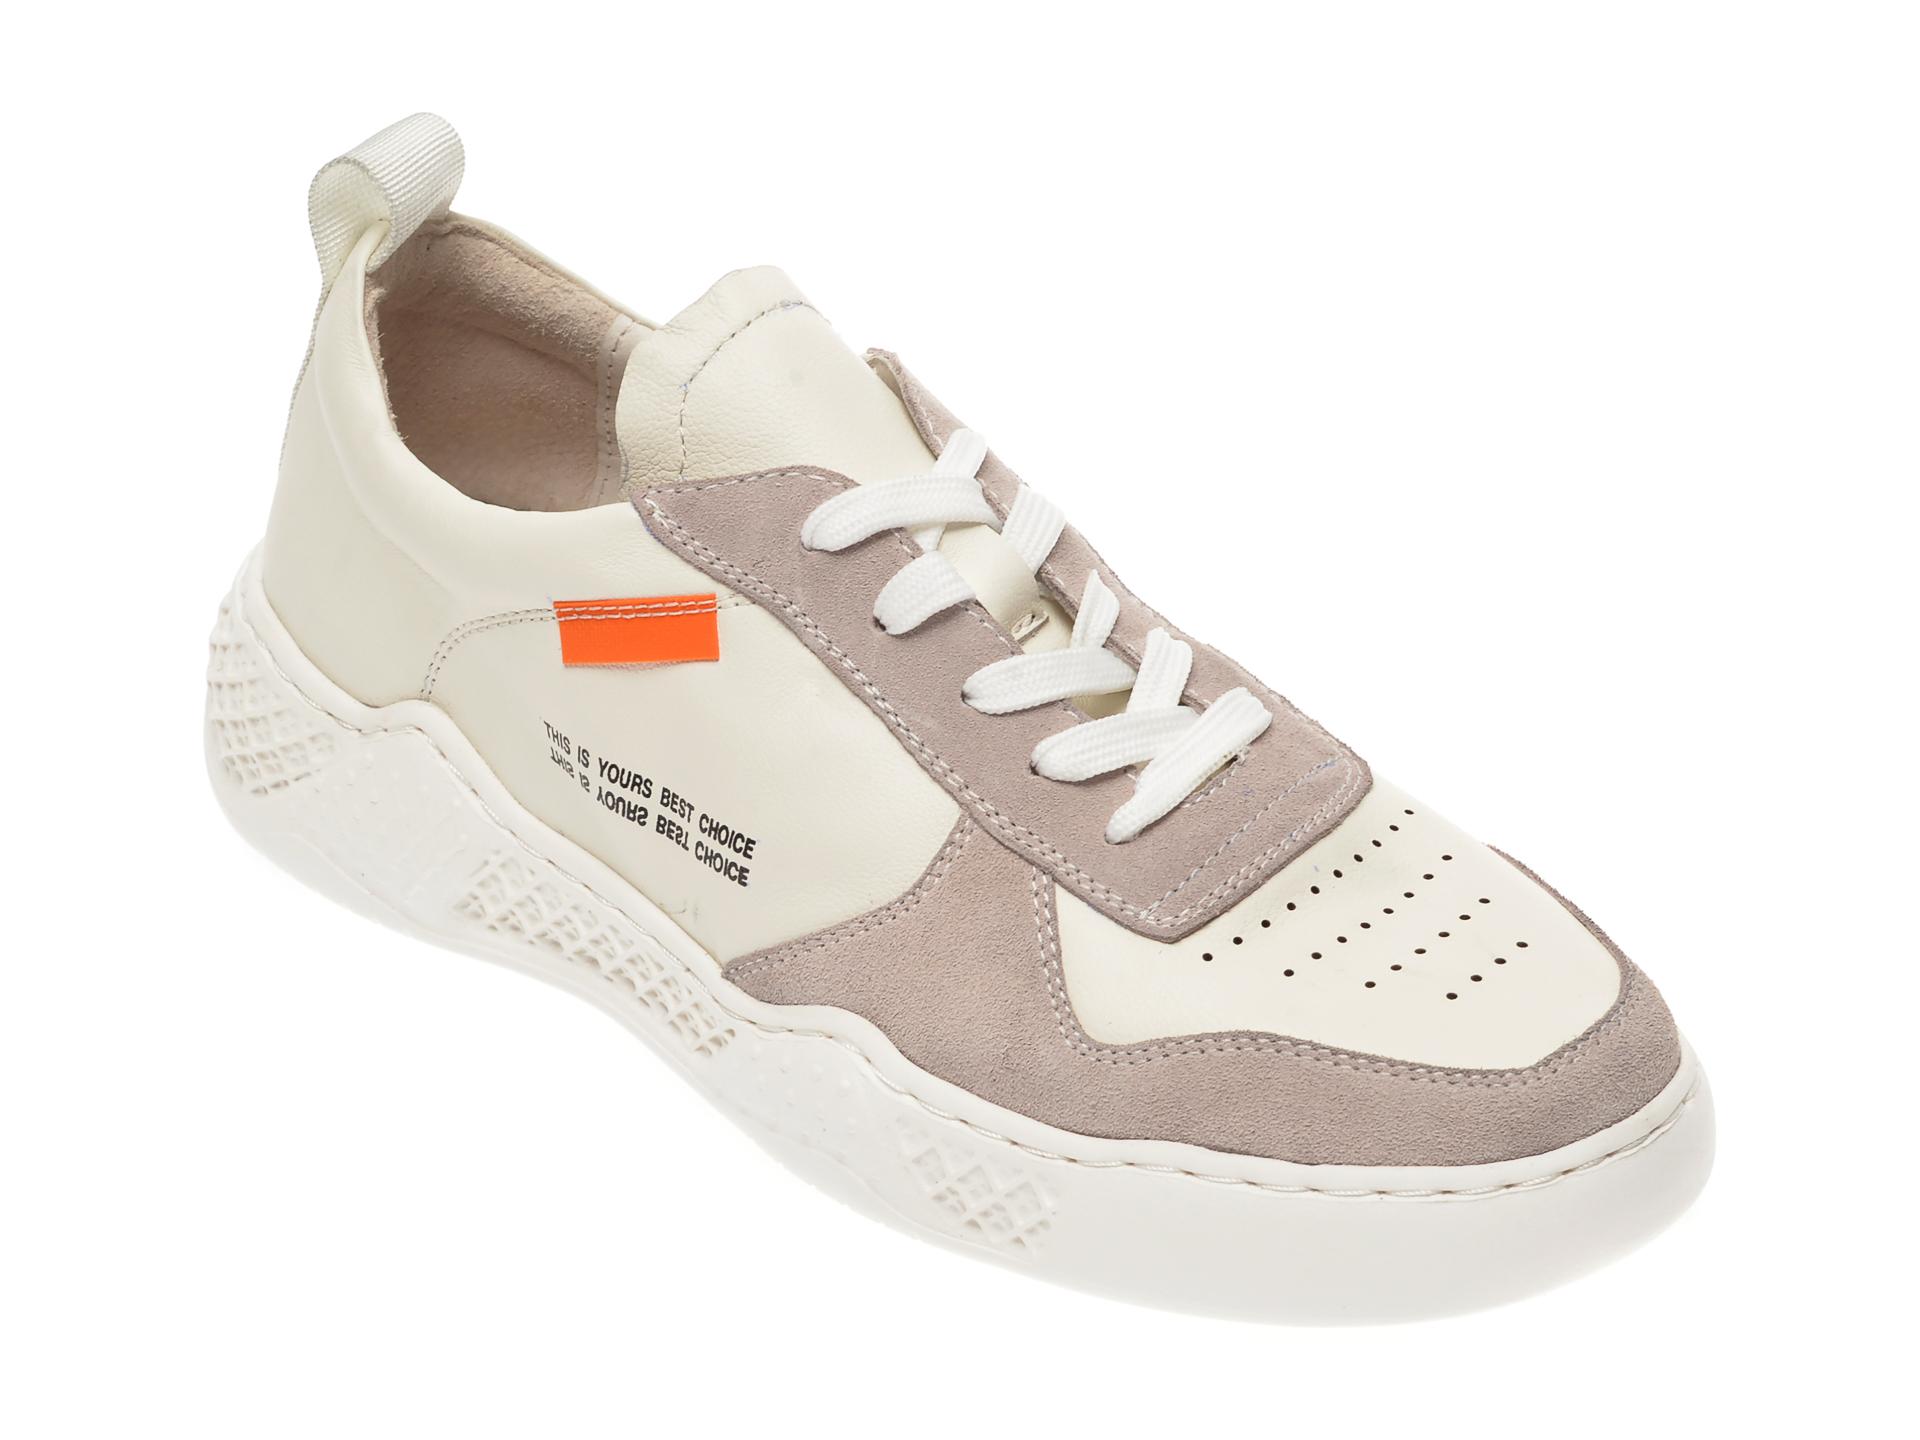 Pantofi sport OTTER albi, 7D91931, din piele naturala imagine